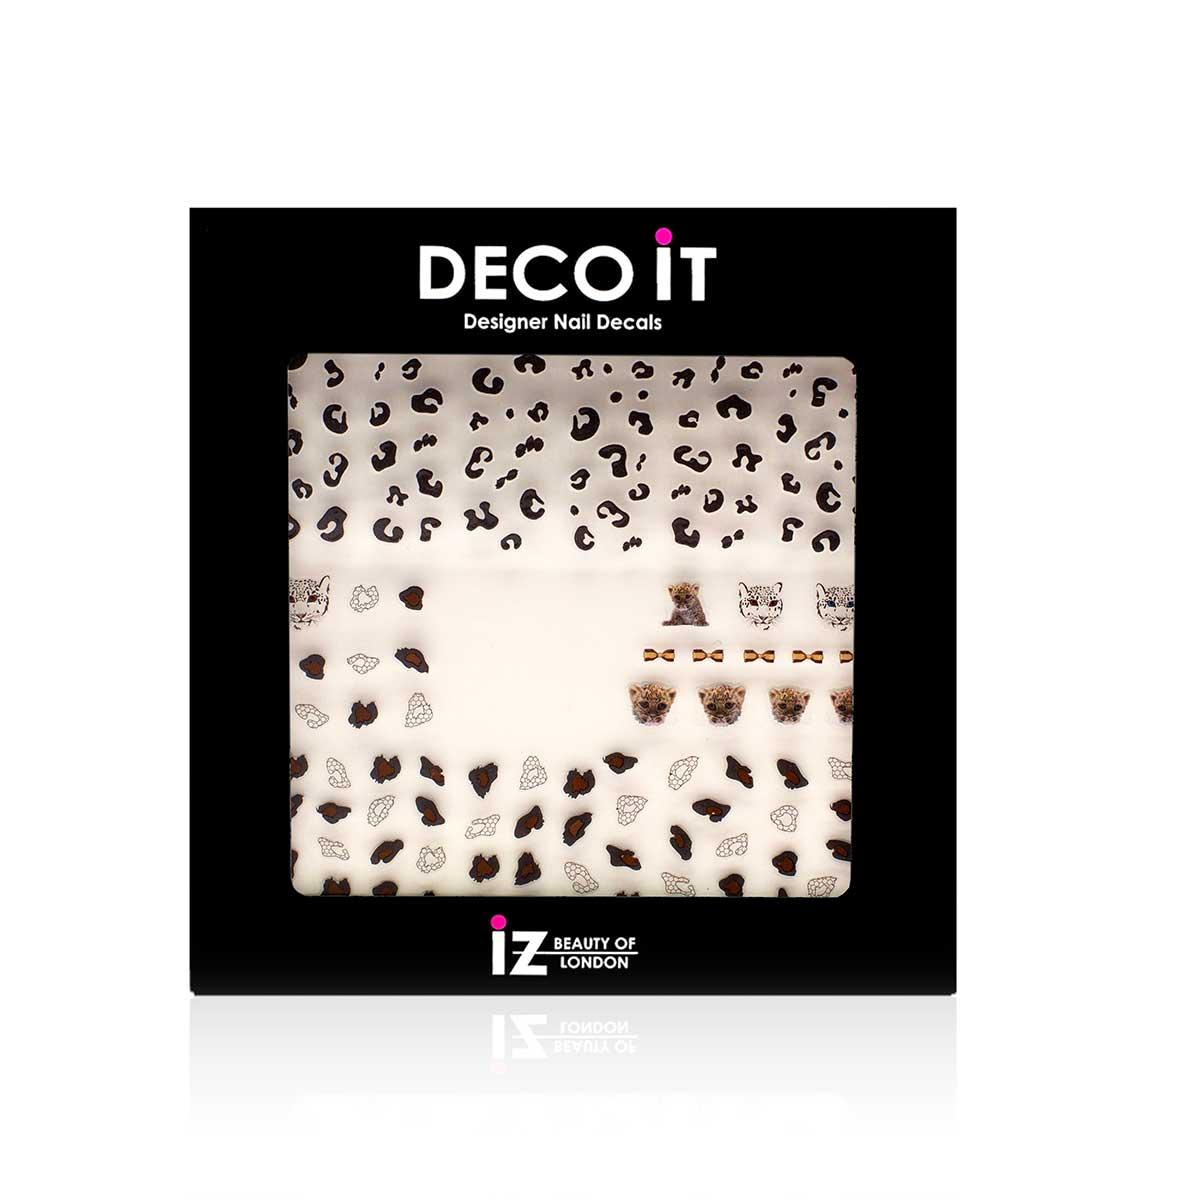 DECWIT-DECO-iT-Wild-Thing